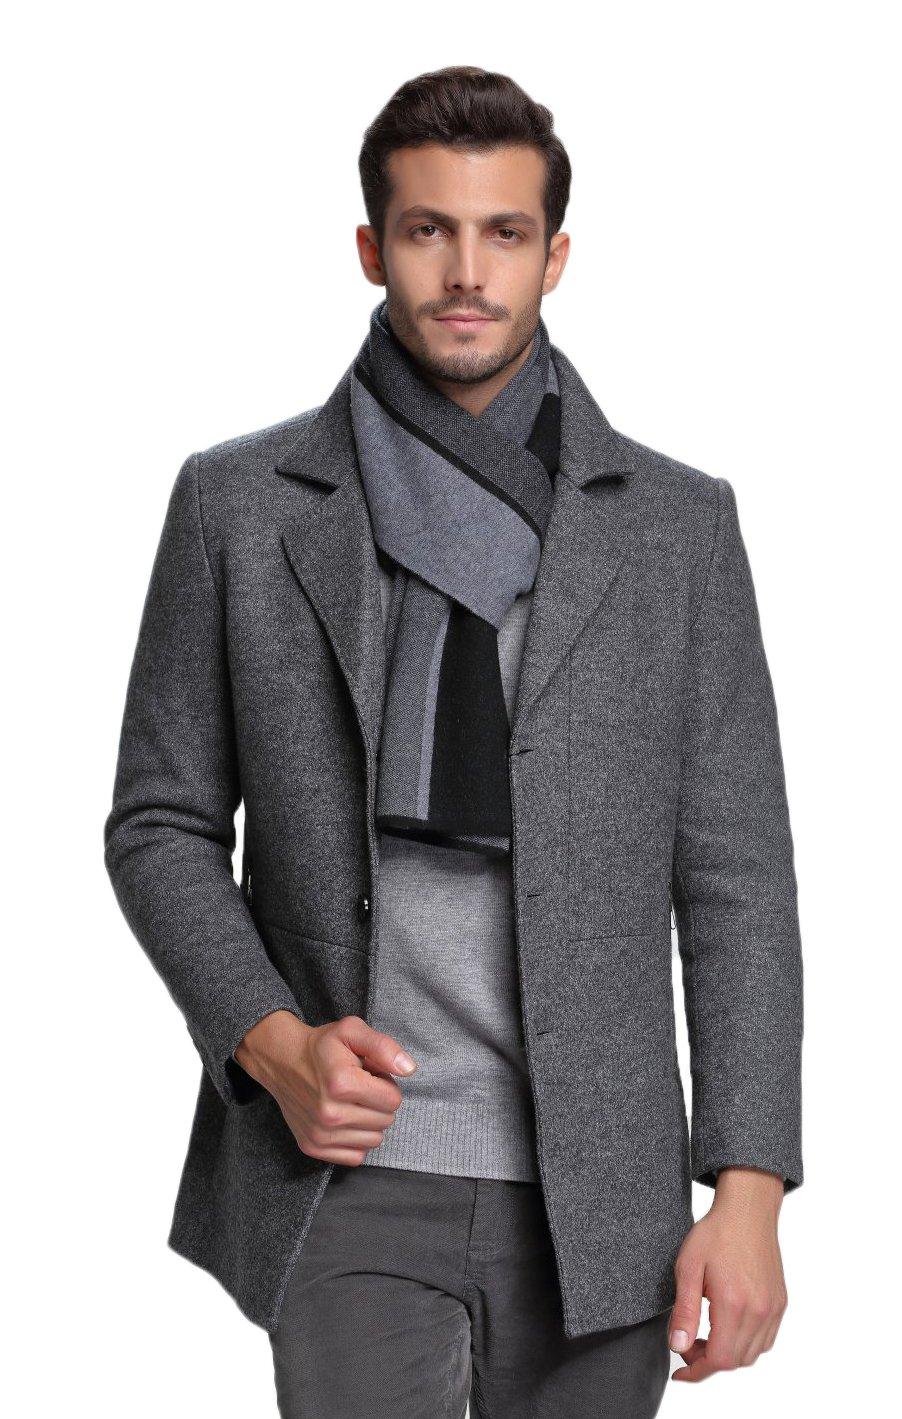 RIONA Men's 100% Australian Merino Wool Scarf Knitted Soft Warm Neckwear with Gift Box (Black)